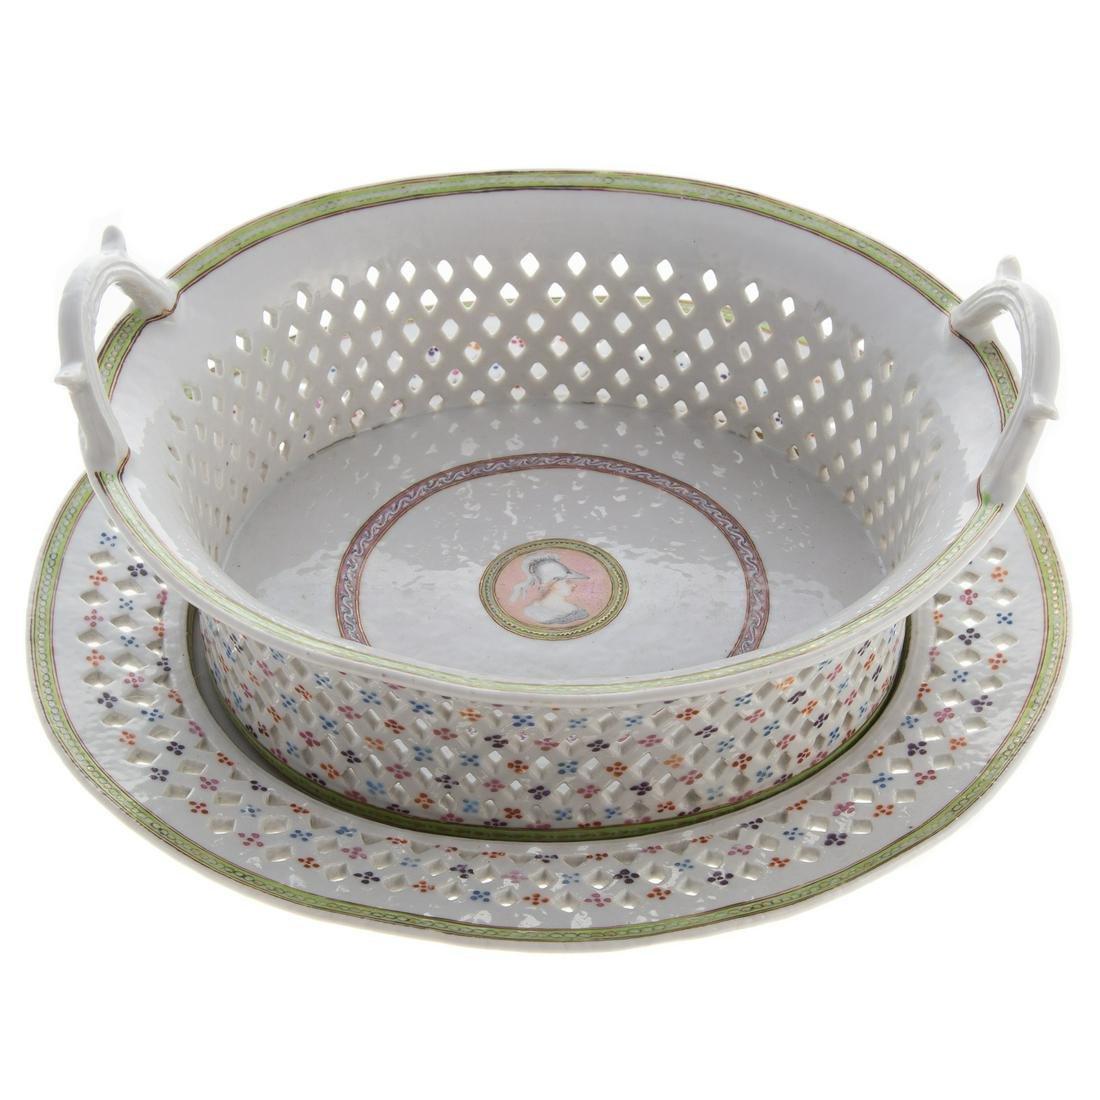 Chinese Export Porcelain Armorial Chestnut Basket